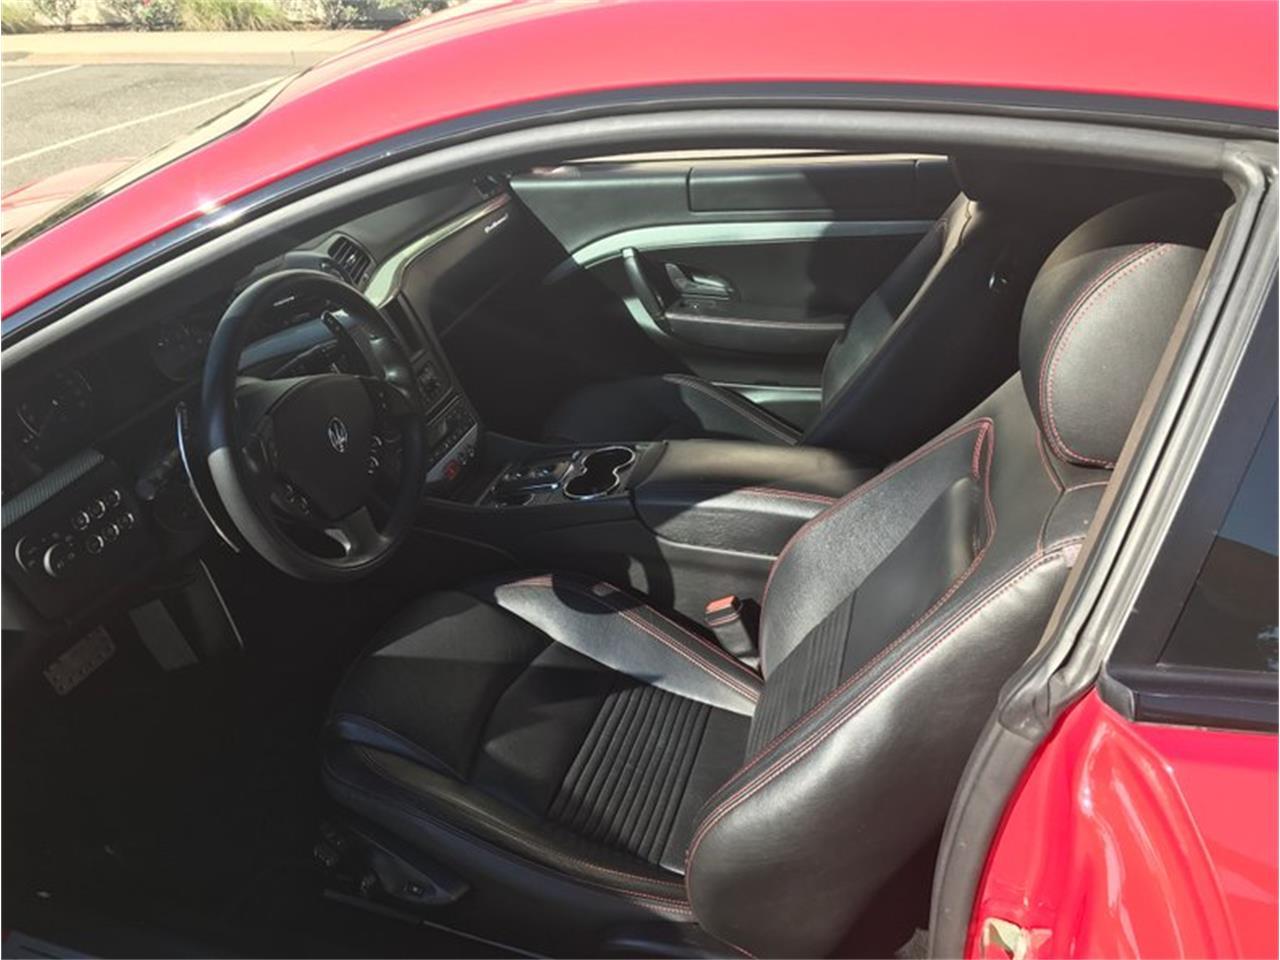 2009 Maserati GranTurismo (CC-1331929) for sale in West Babylon, New York